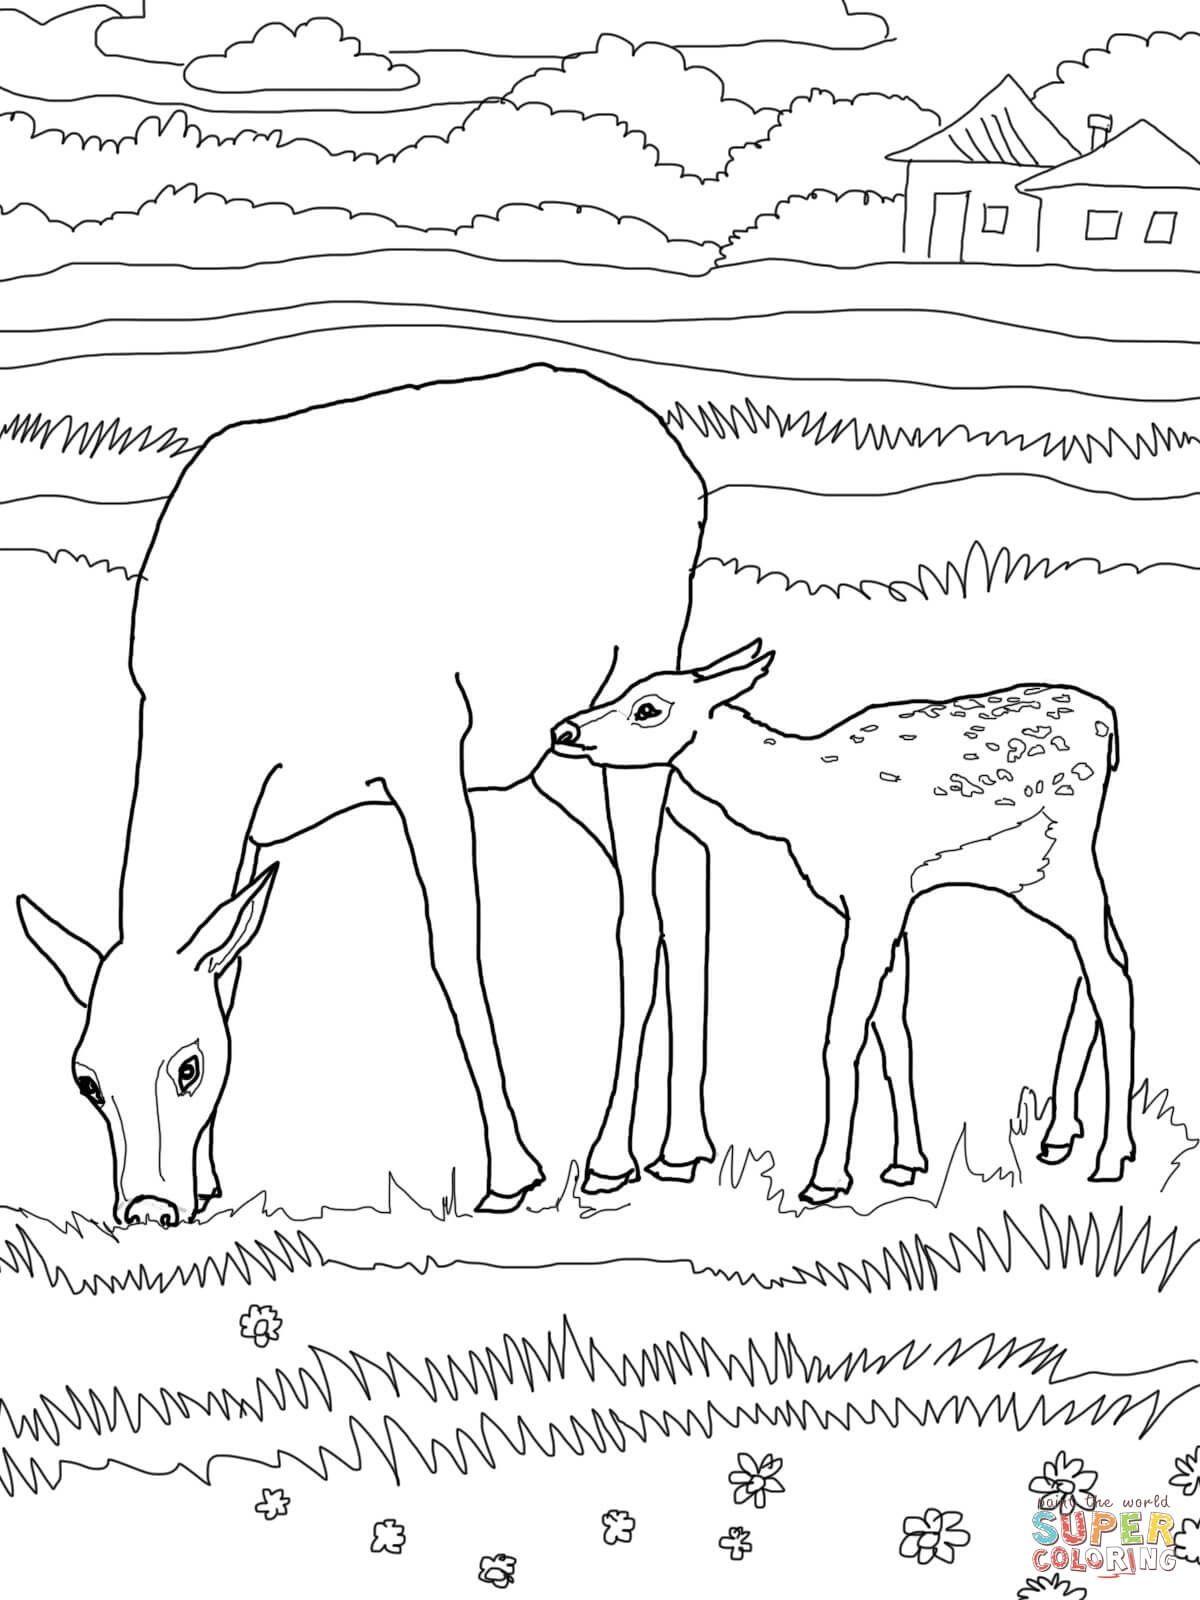 Free coloring pages elk - Elk Coloring Pages Elk Coloring Pages Bull Elk Coloring Pages